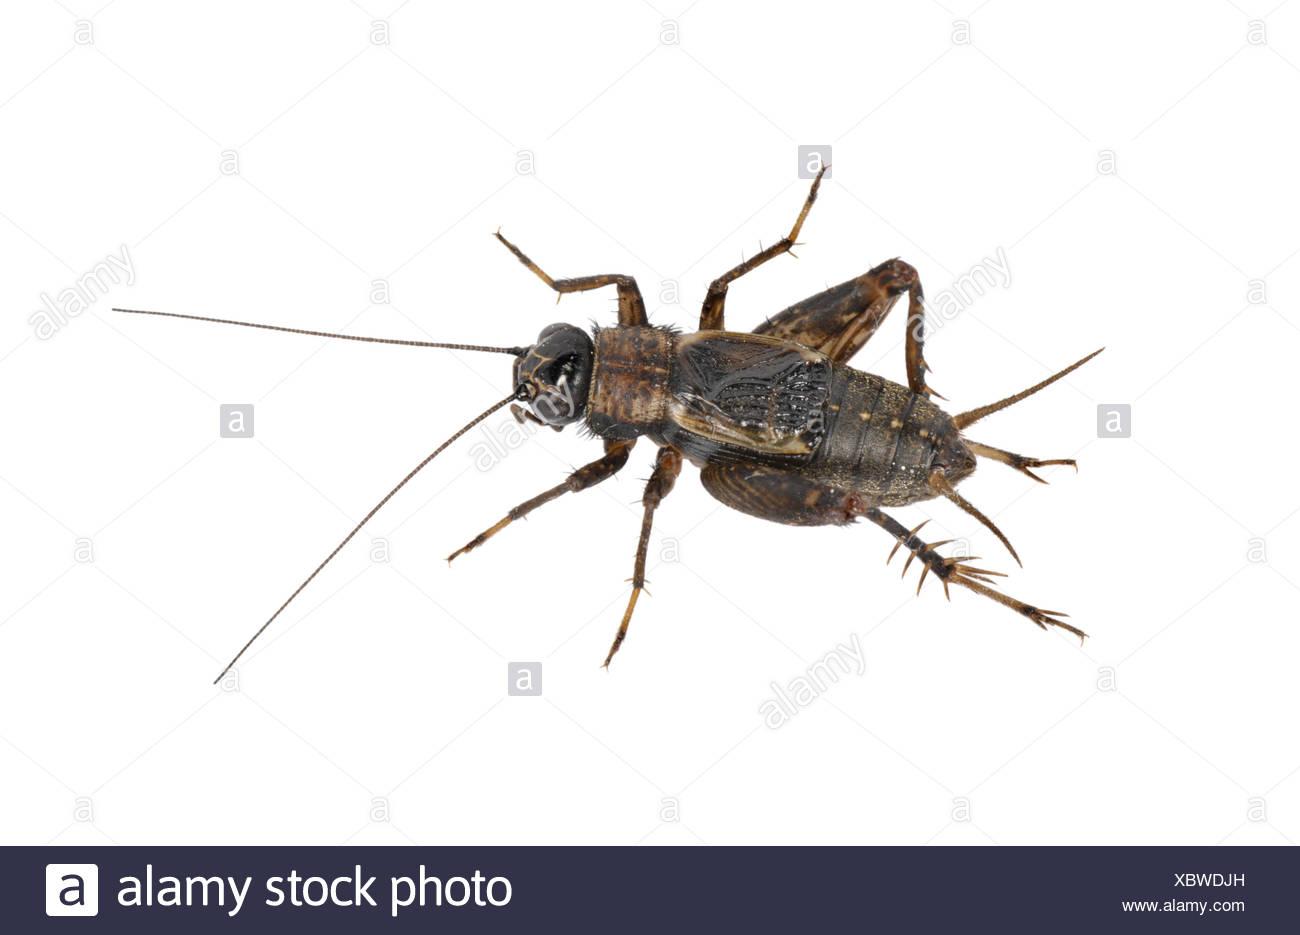 Madera - Grillo Nemobius sylvestris - macho Imagen De Stock